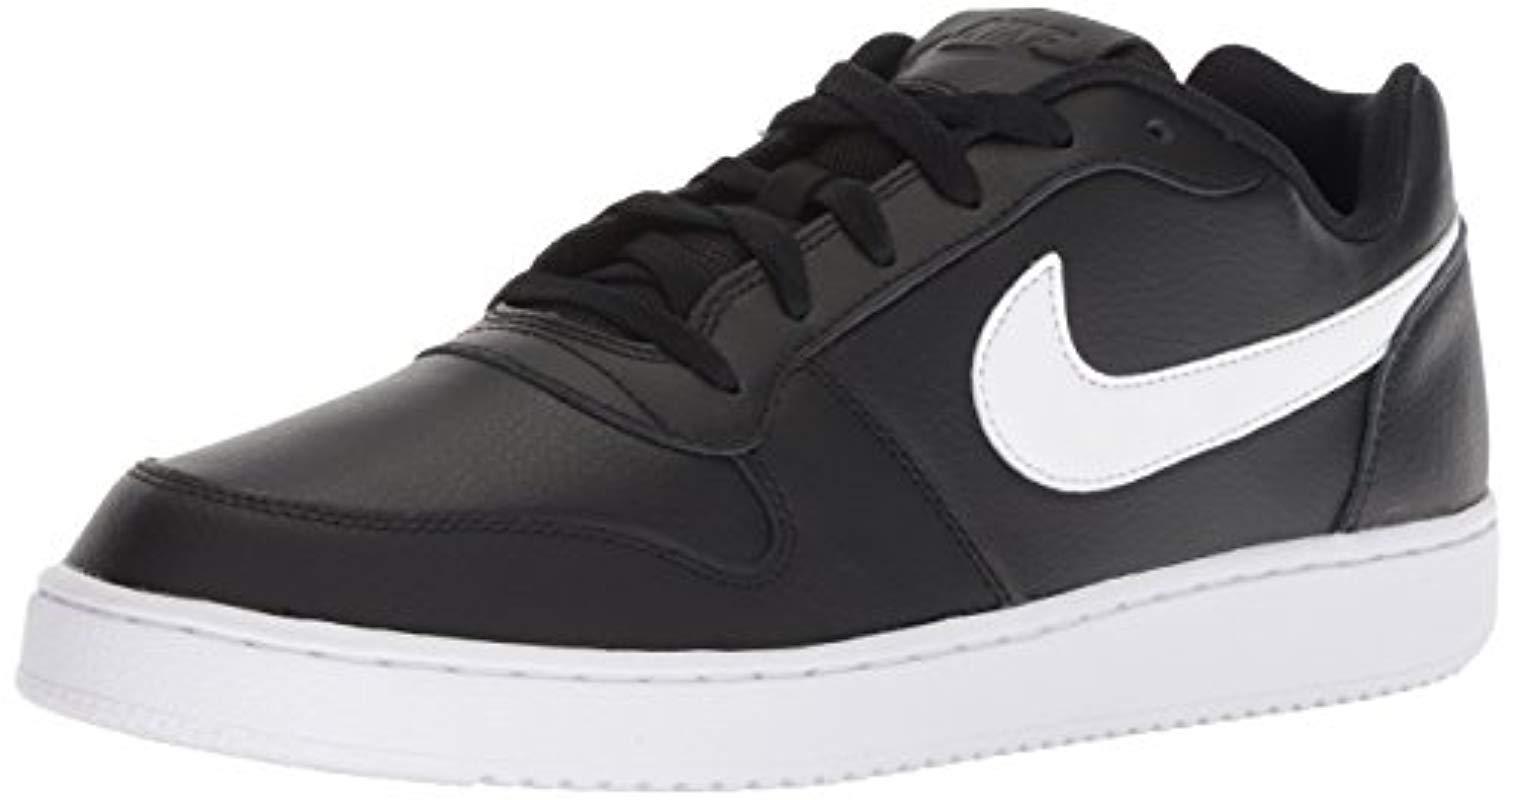 Lyst Nike Ebernon Negro Low Sneaker in Negro Ebernon for Hombre 3d28f6